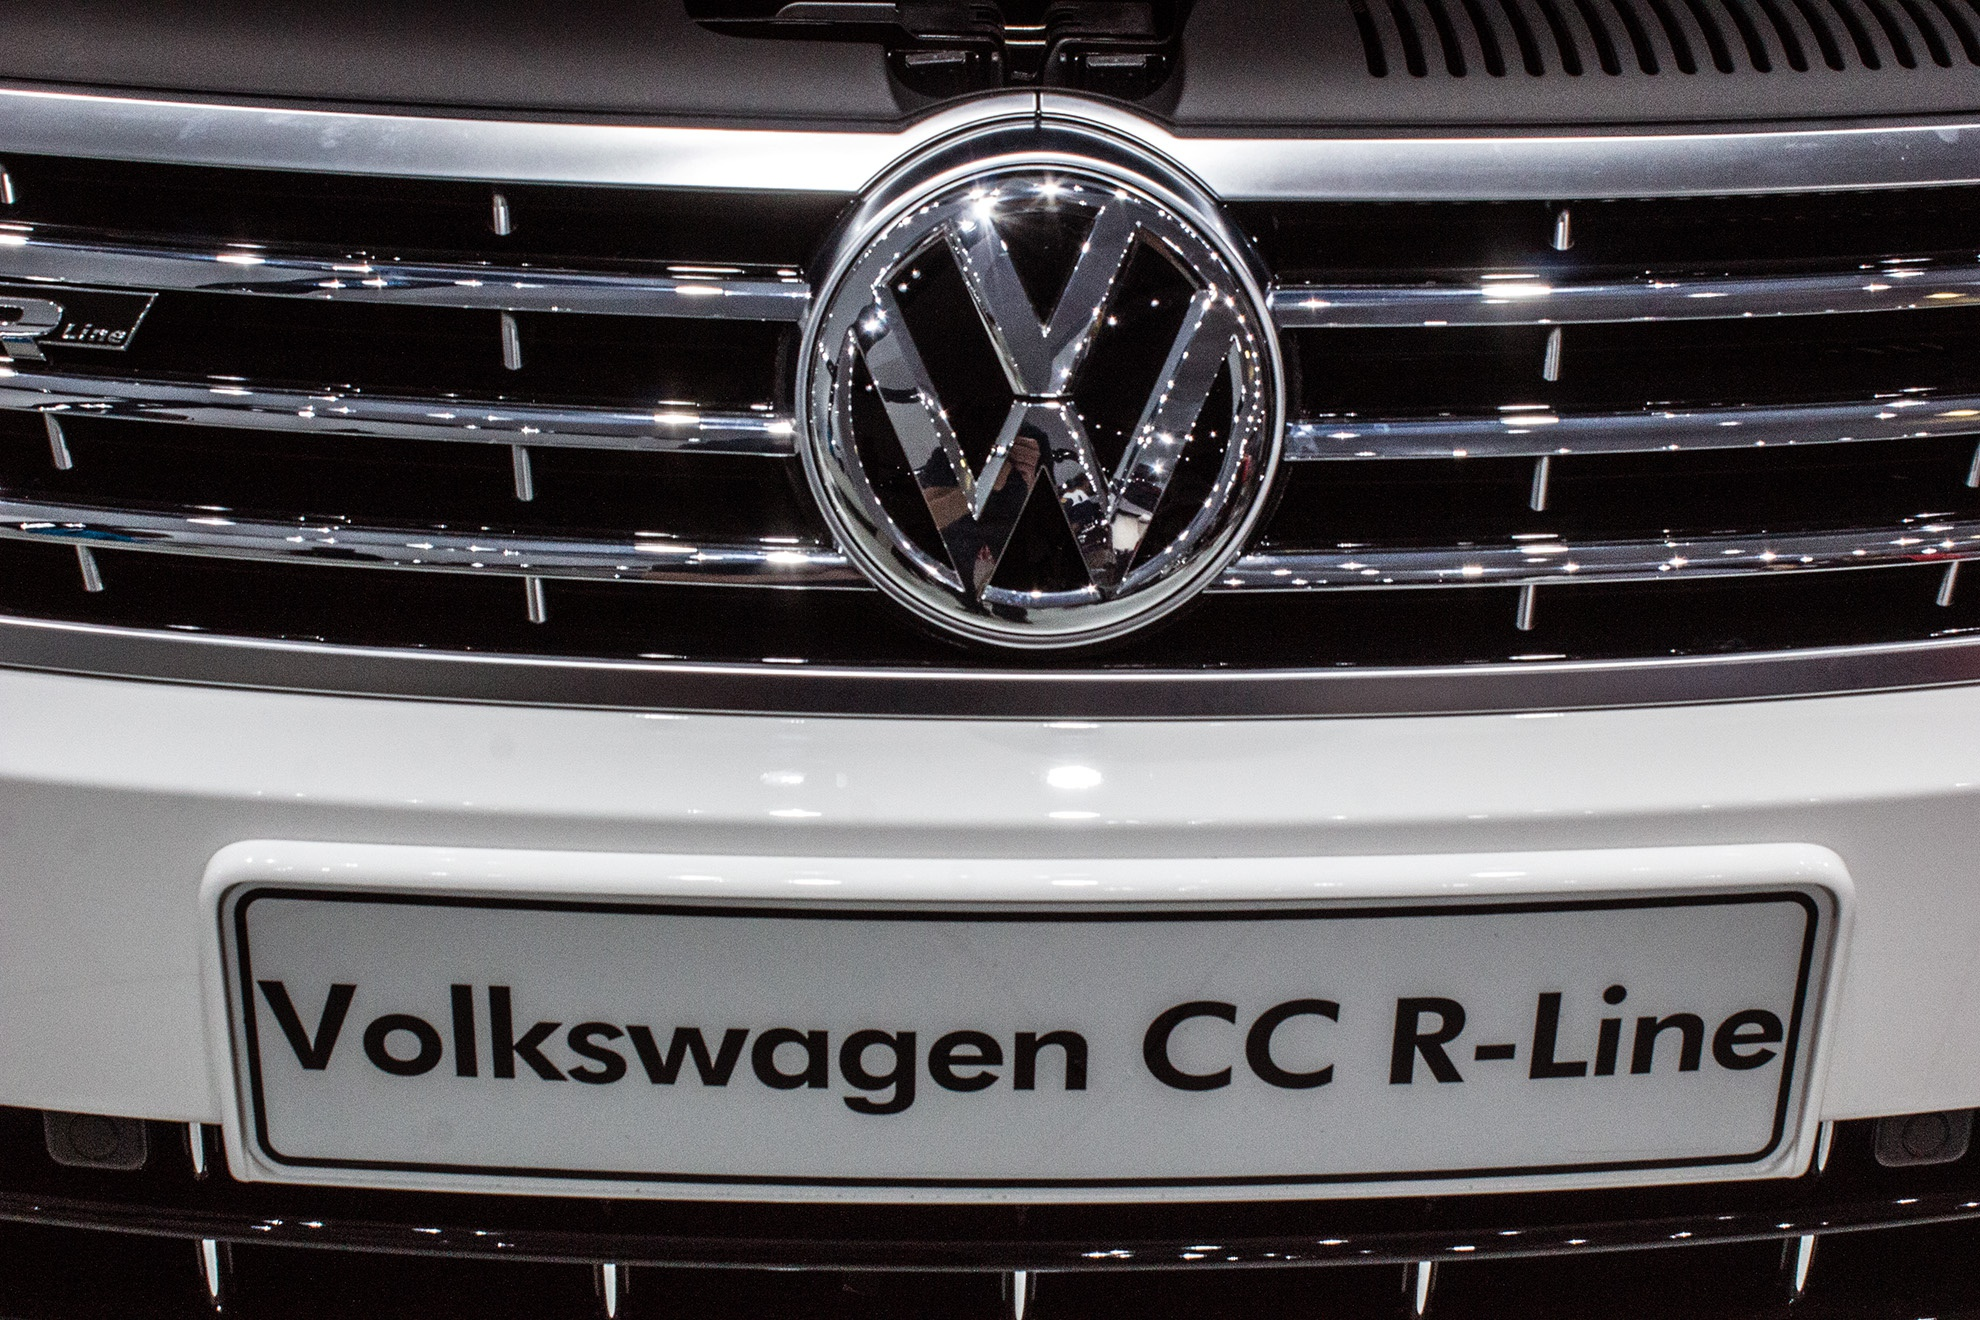 Volkswagen Logo Volkswagen Car Symbol Meaning And History